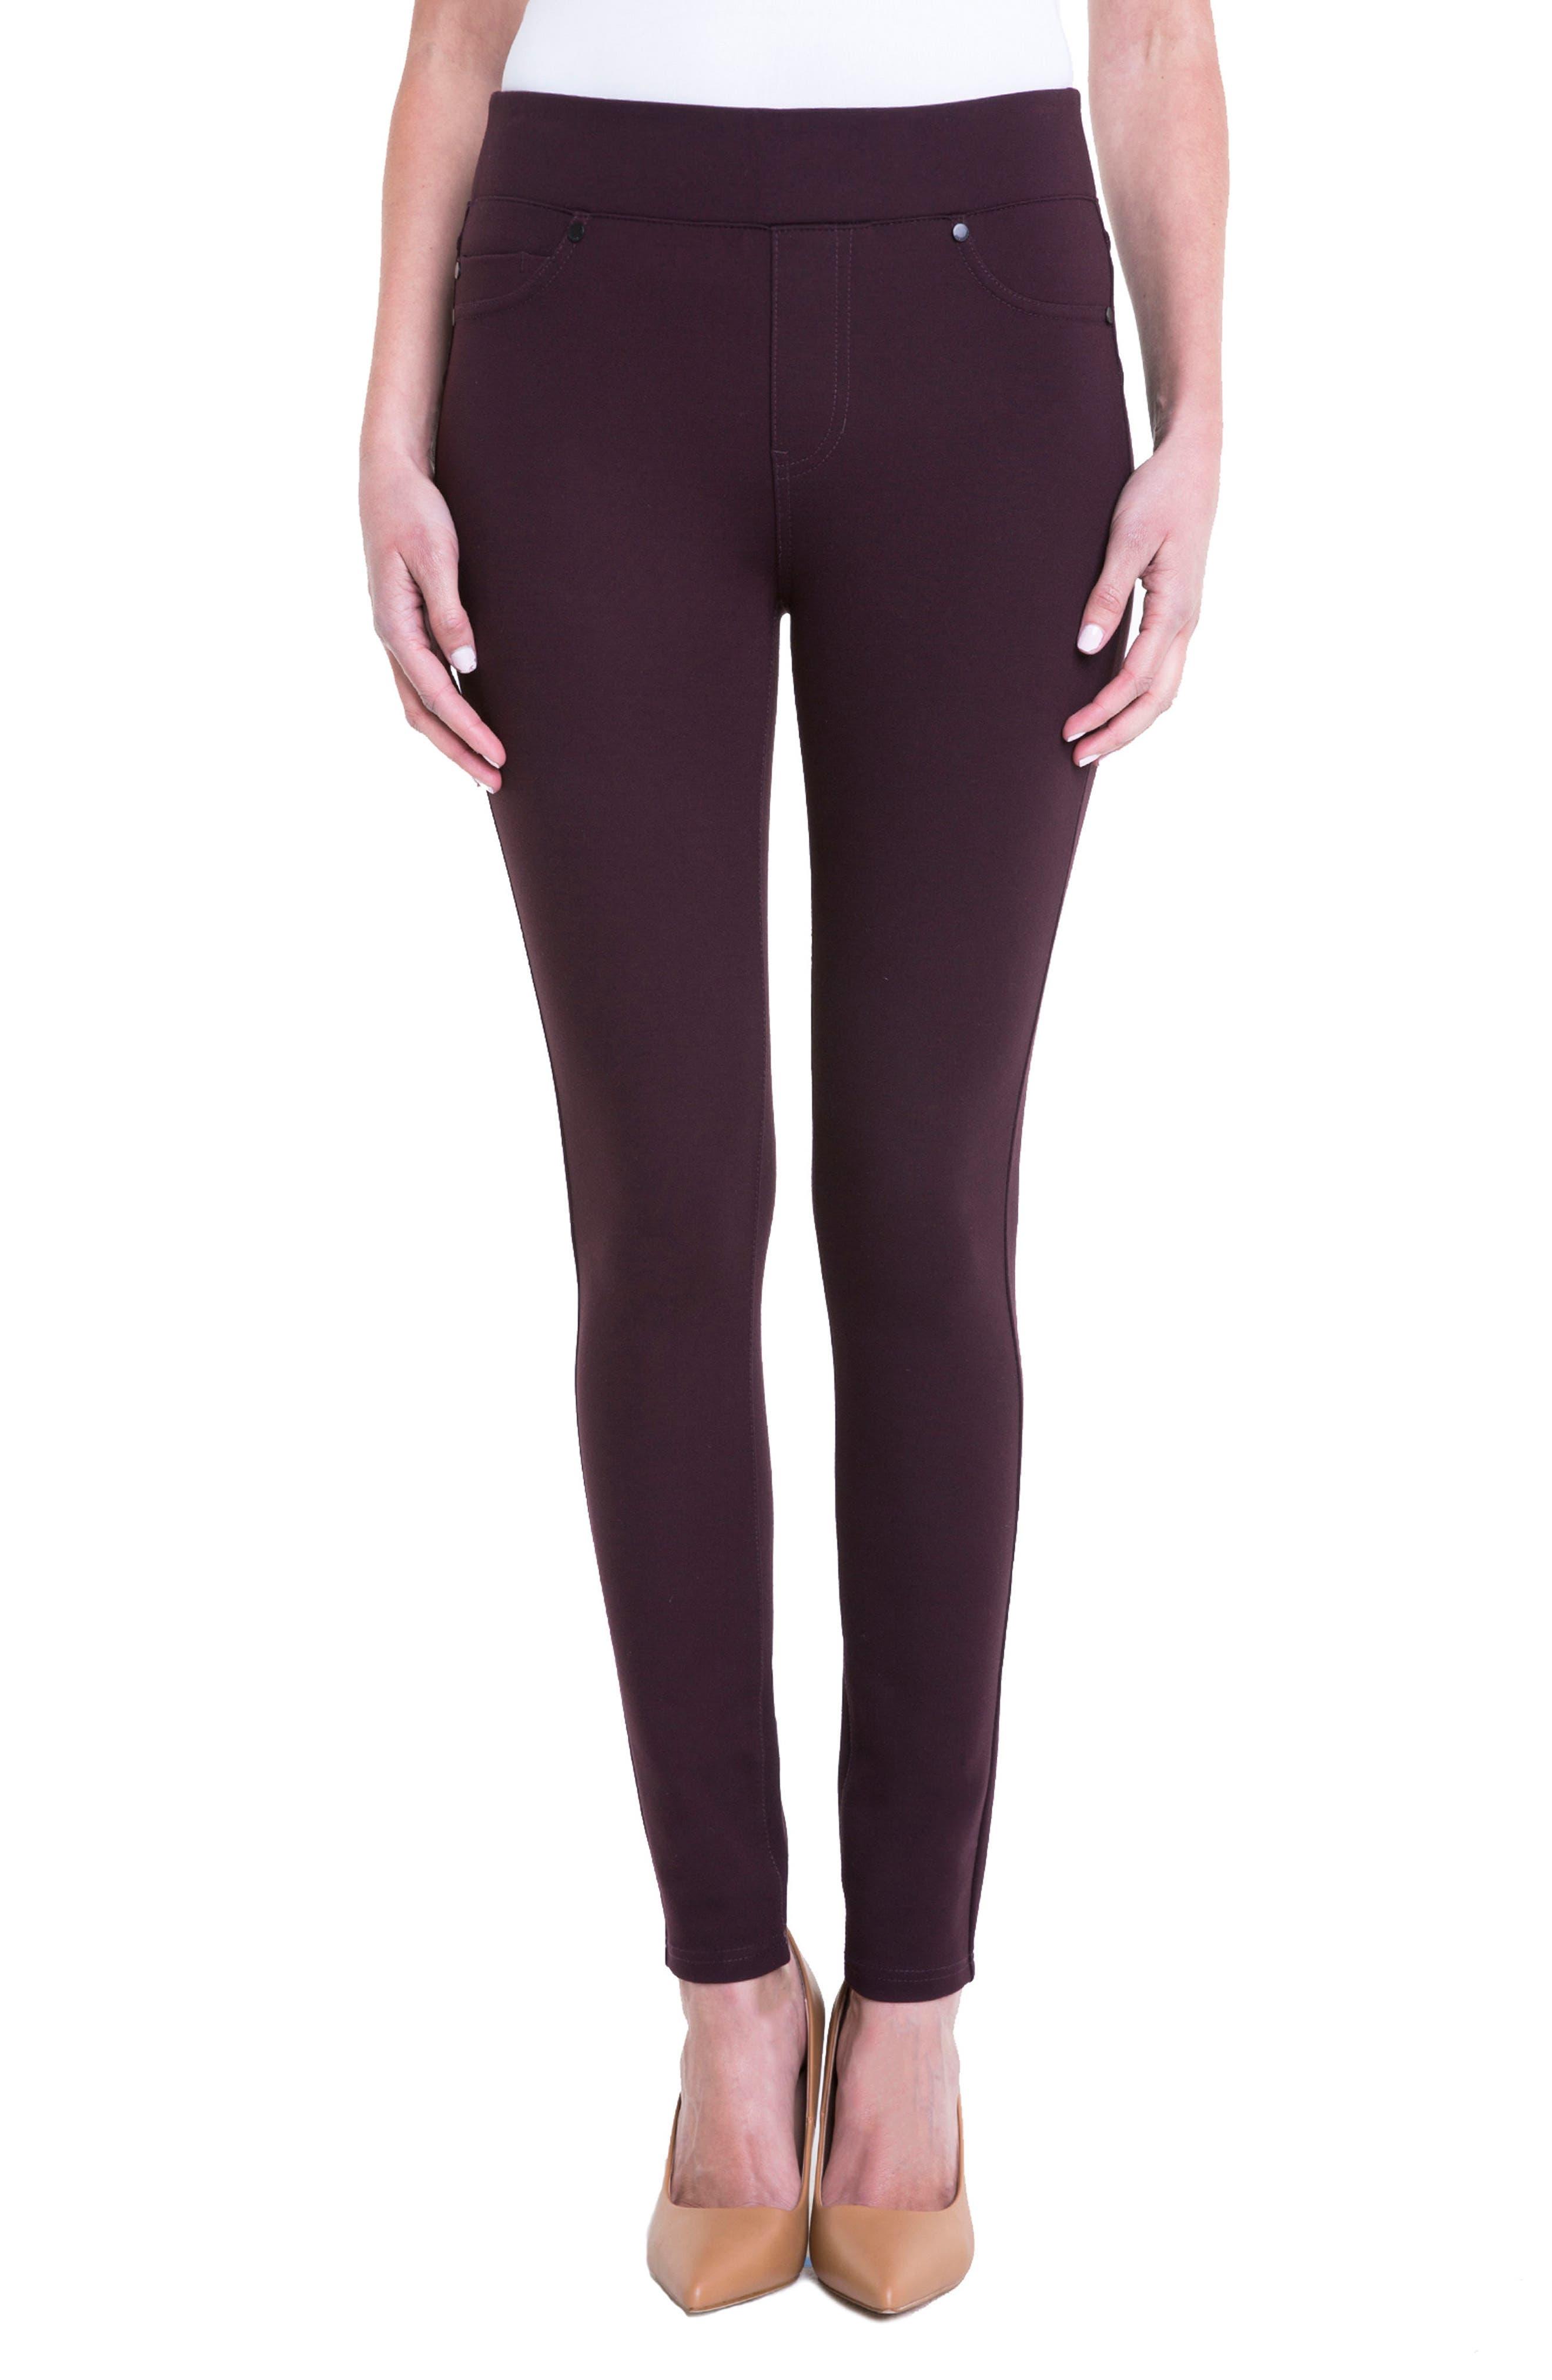 Main Image - Liverpool Jeans Company Piper Hugger Leggings (Aubergine)